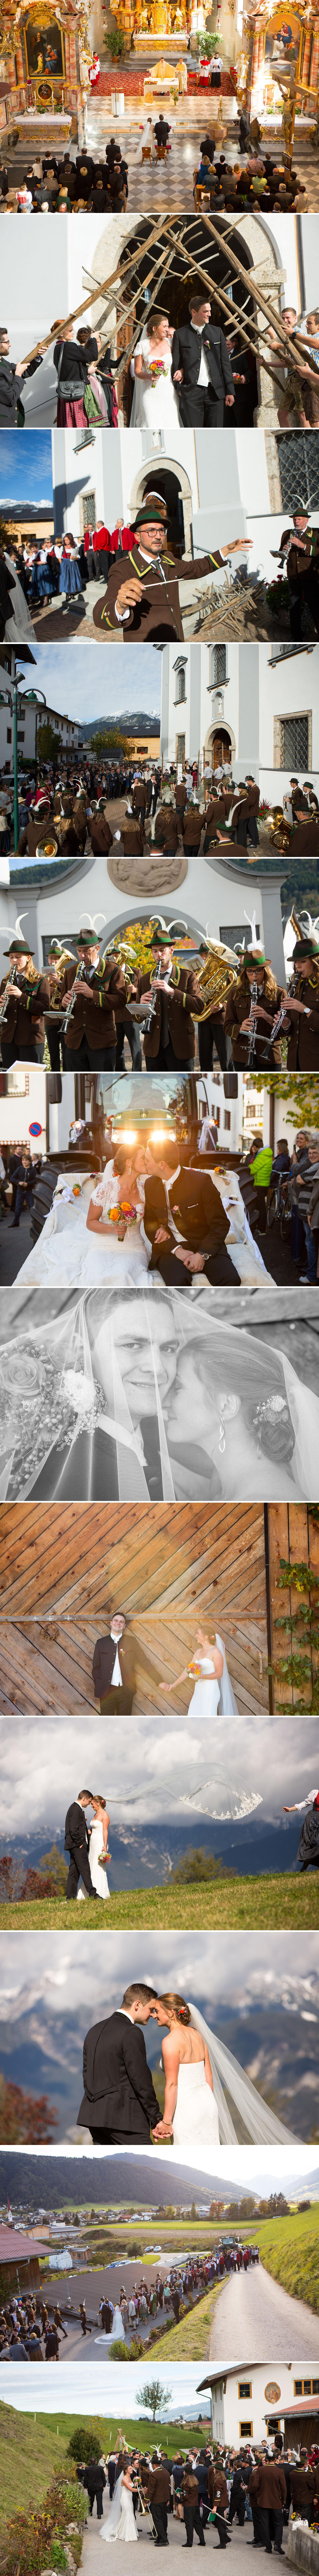 Hochzeitsfotograf Tirol, Fotograf Hochzeit Tirol